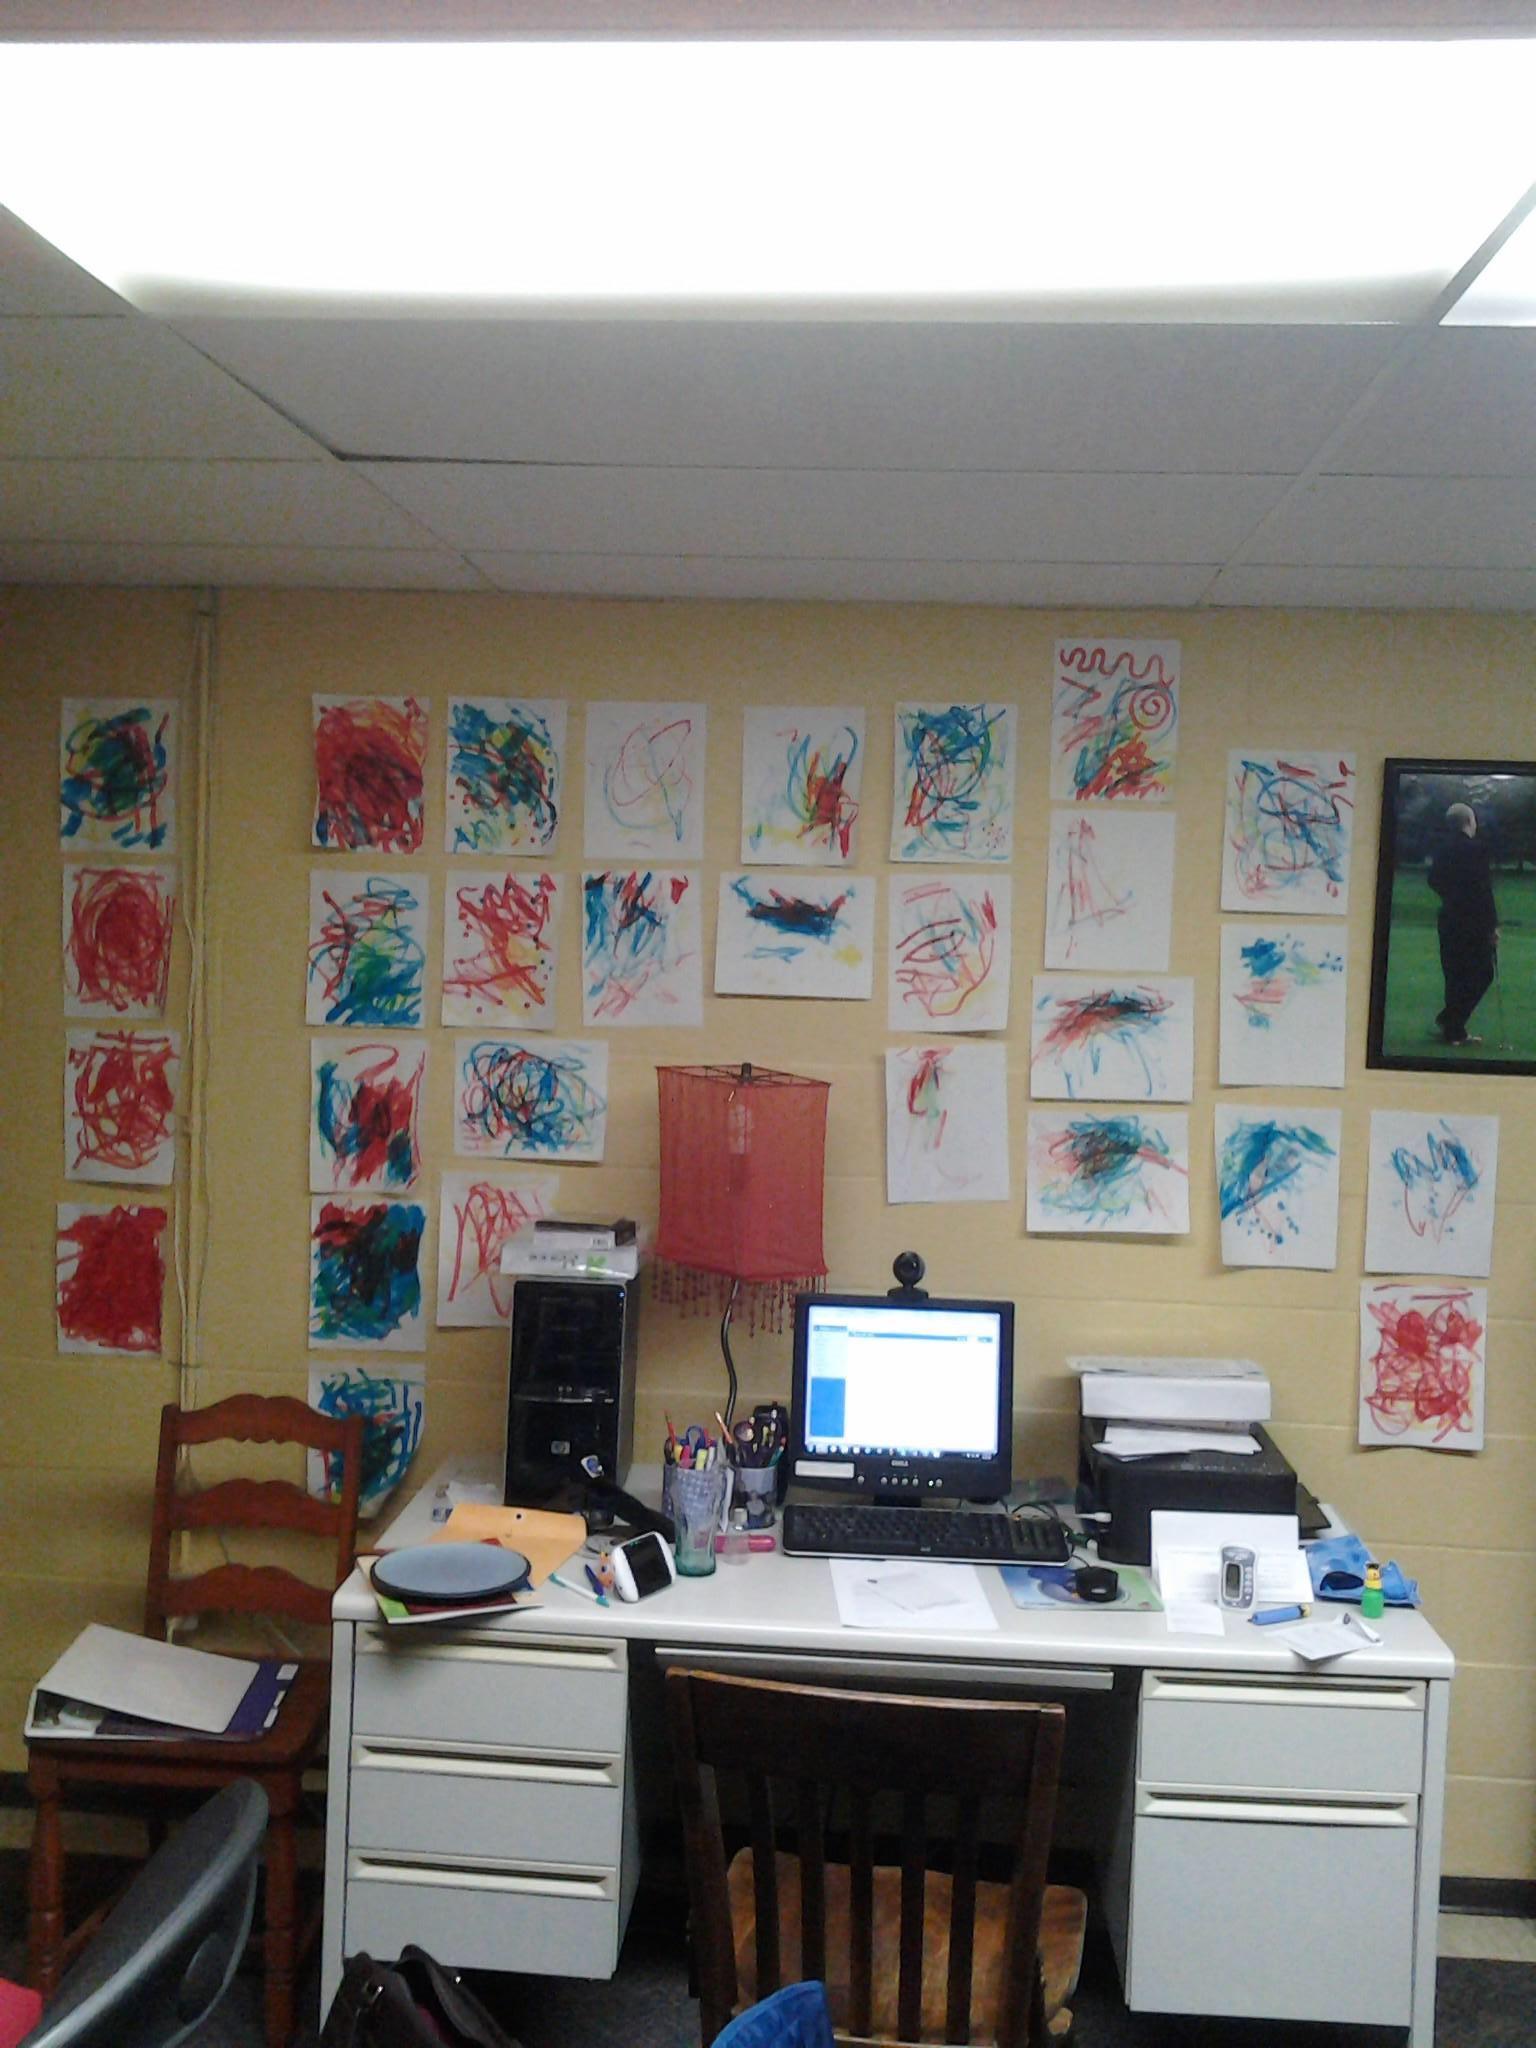 Caleb's Gallery